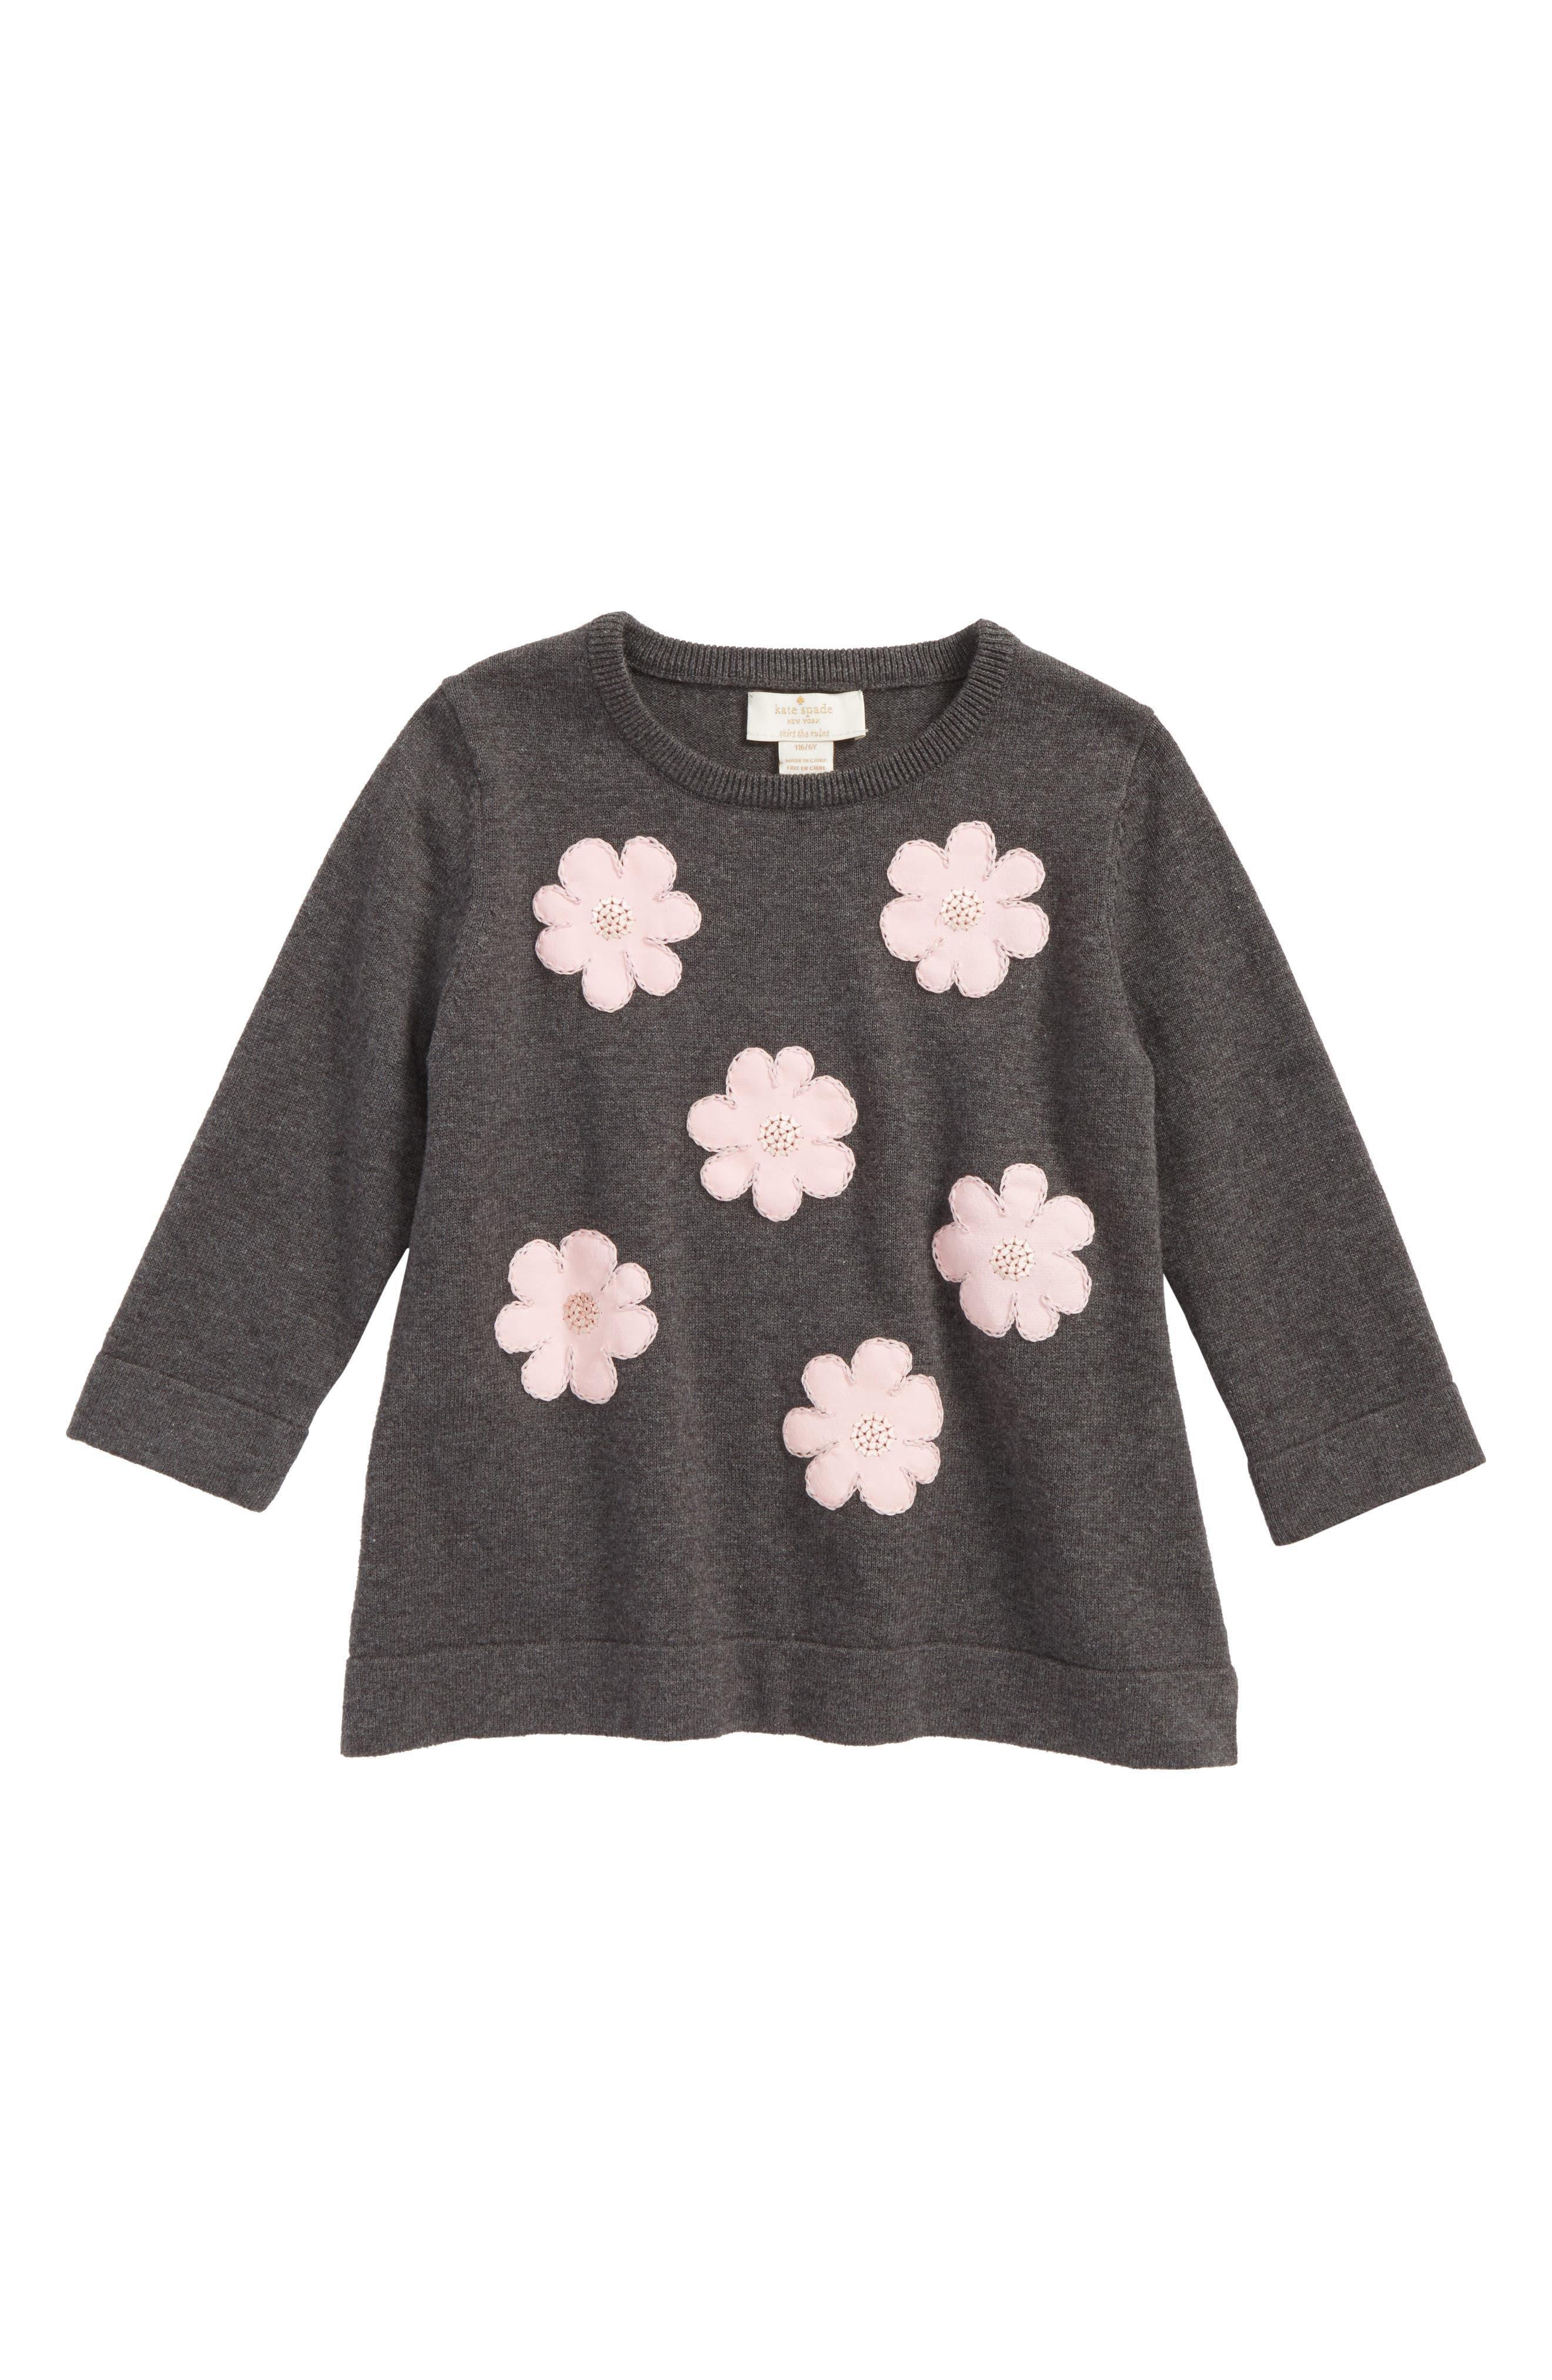 kate spade new york swing sweater (Toddler Girls & Little Girls)